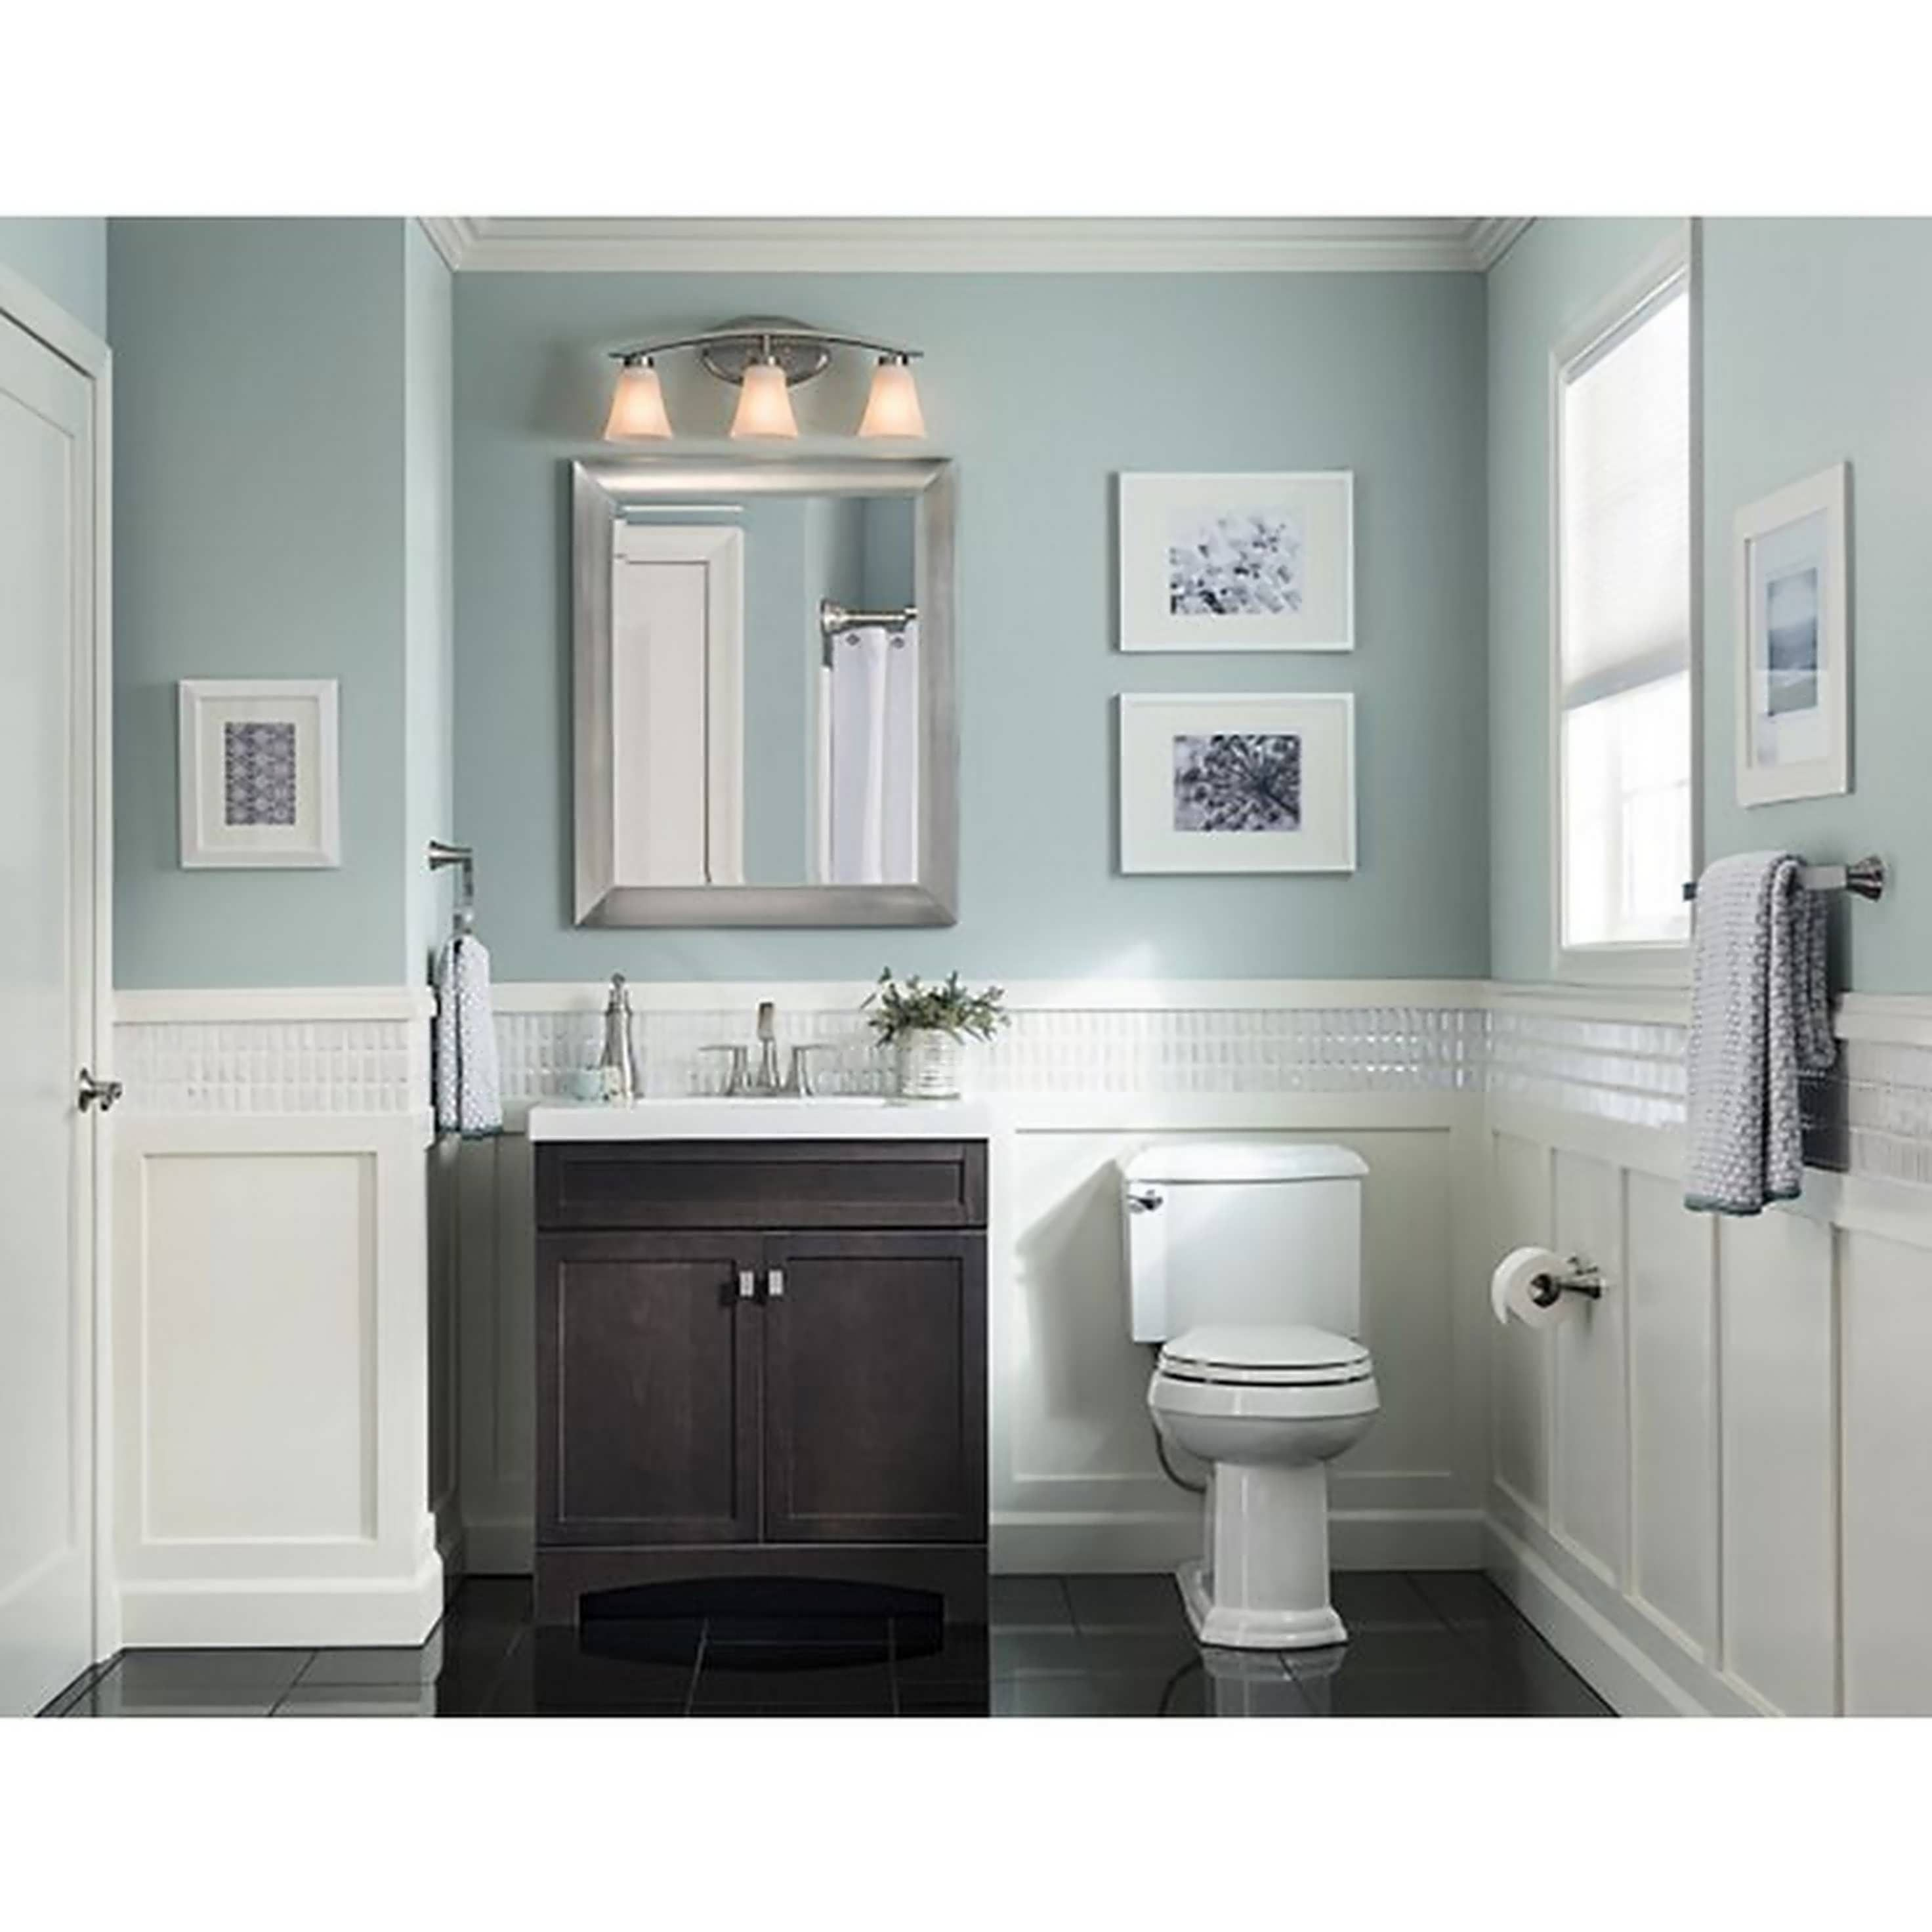 Affordable Bathroom Vanity For Good Bathroom Designs